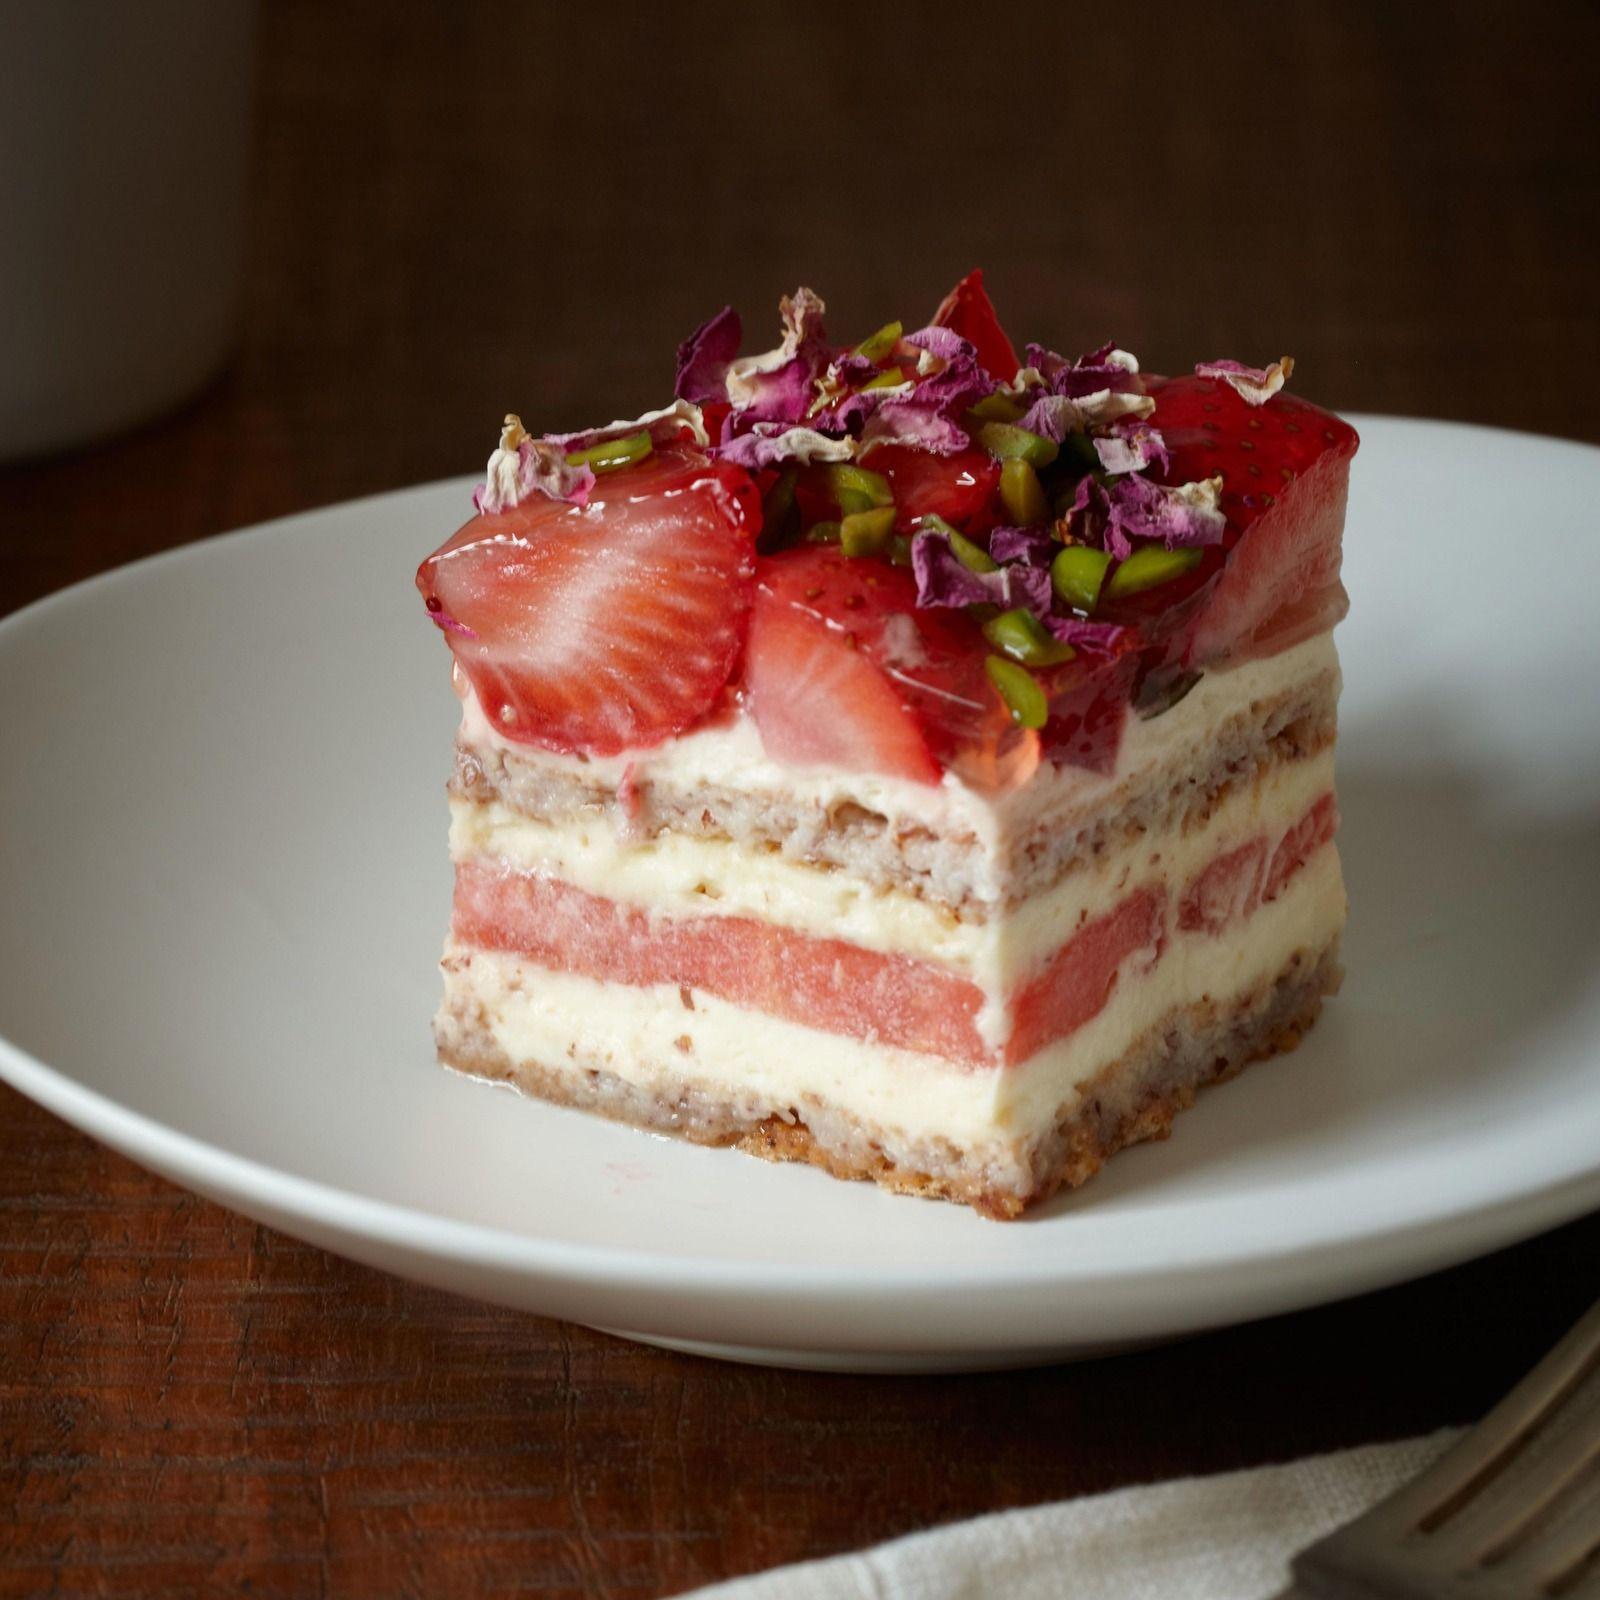 Almond dacquoise, rose scented cream, watermelon